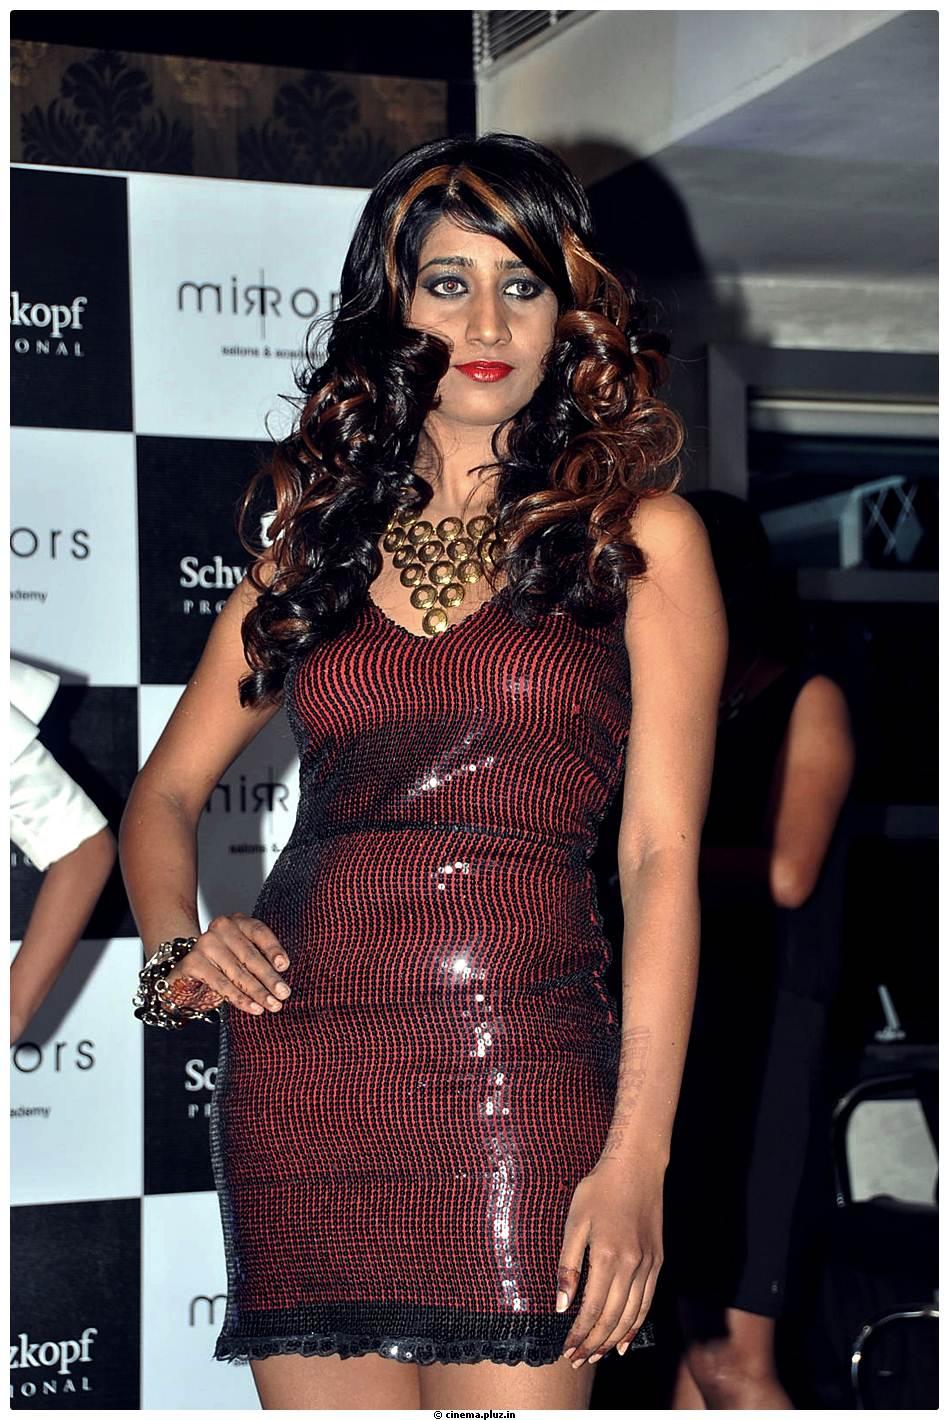 Vijay singh mallika sherawat age difference in dating 5